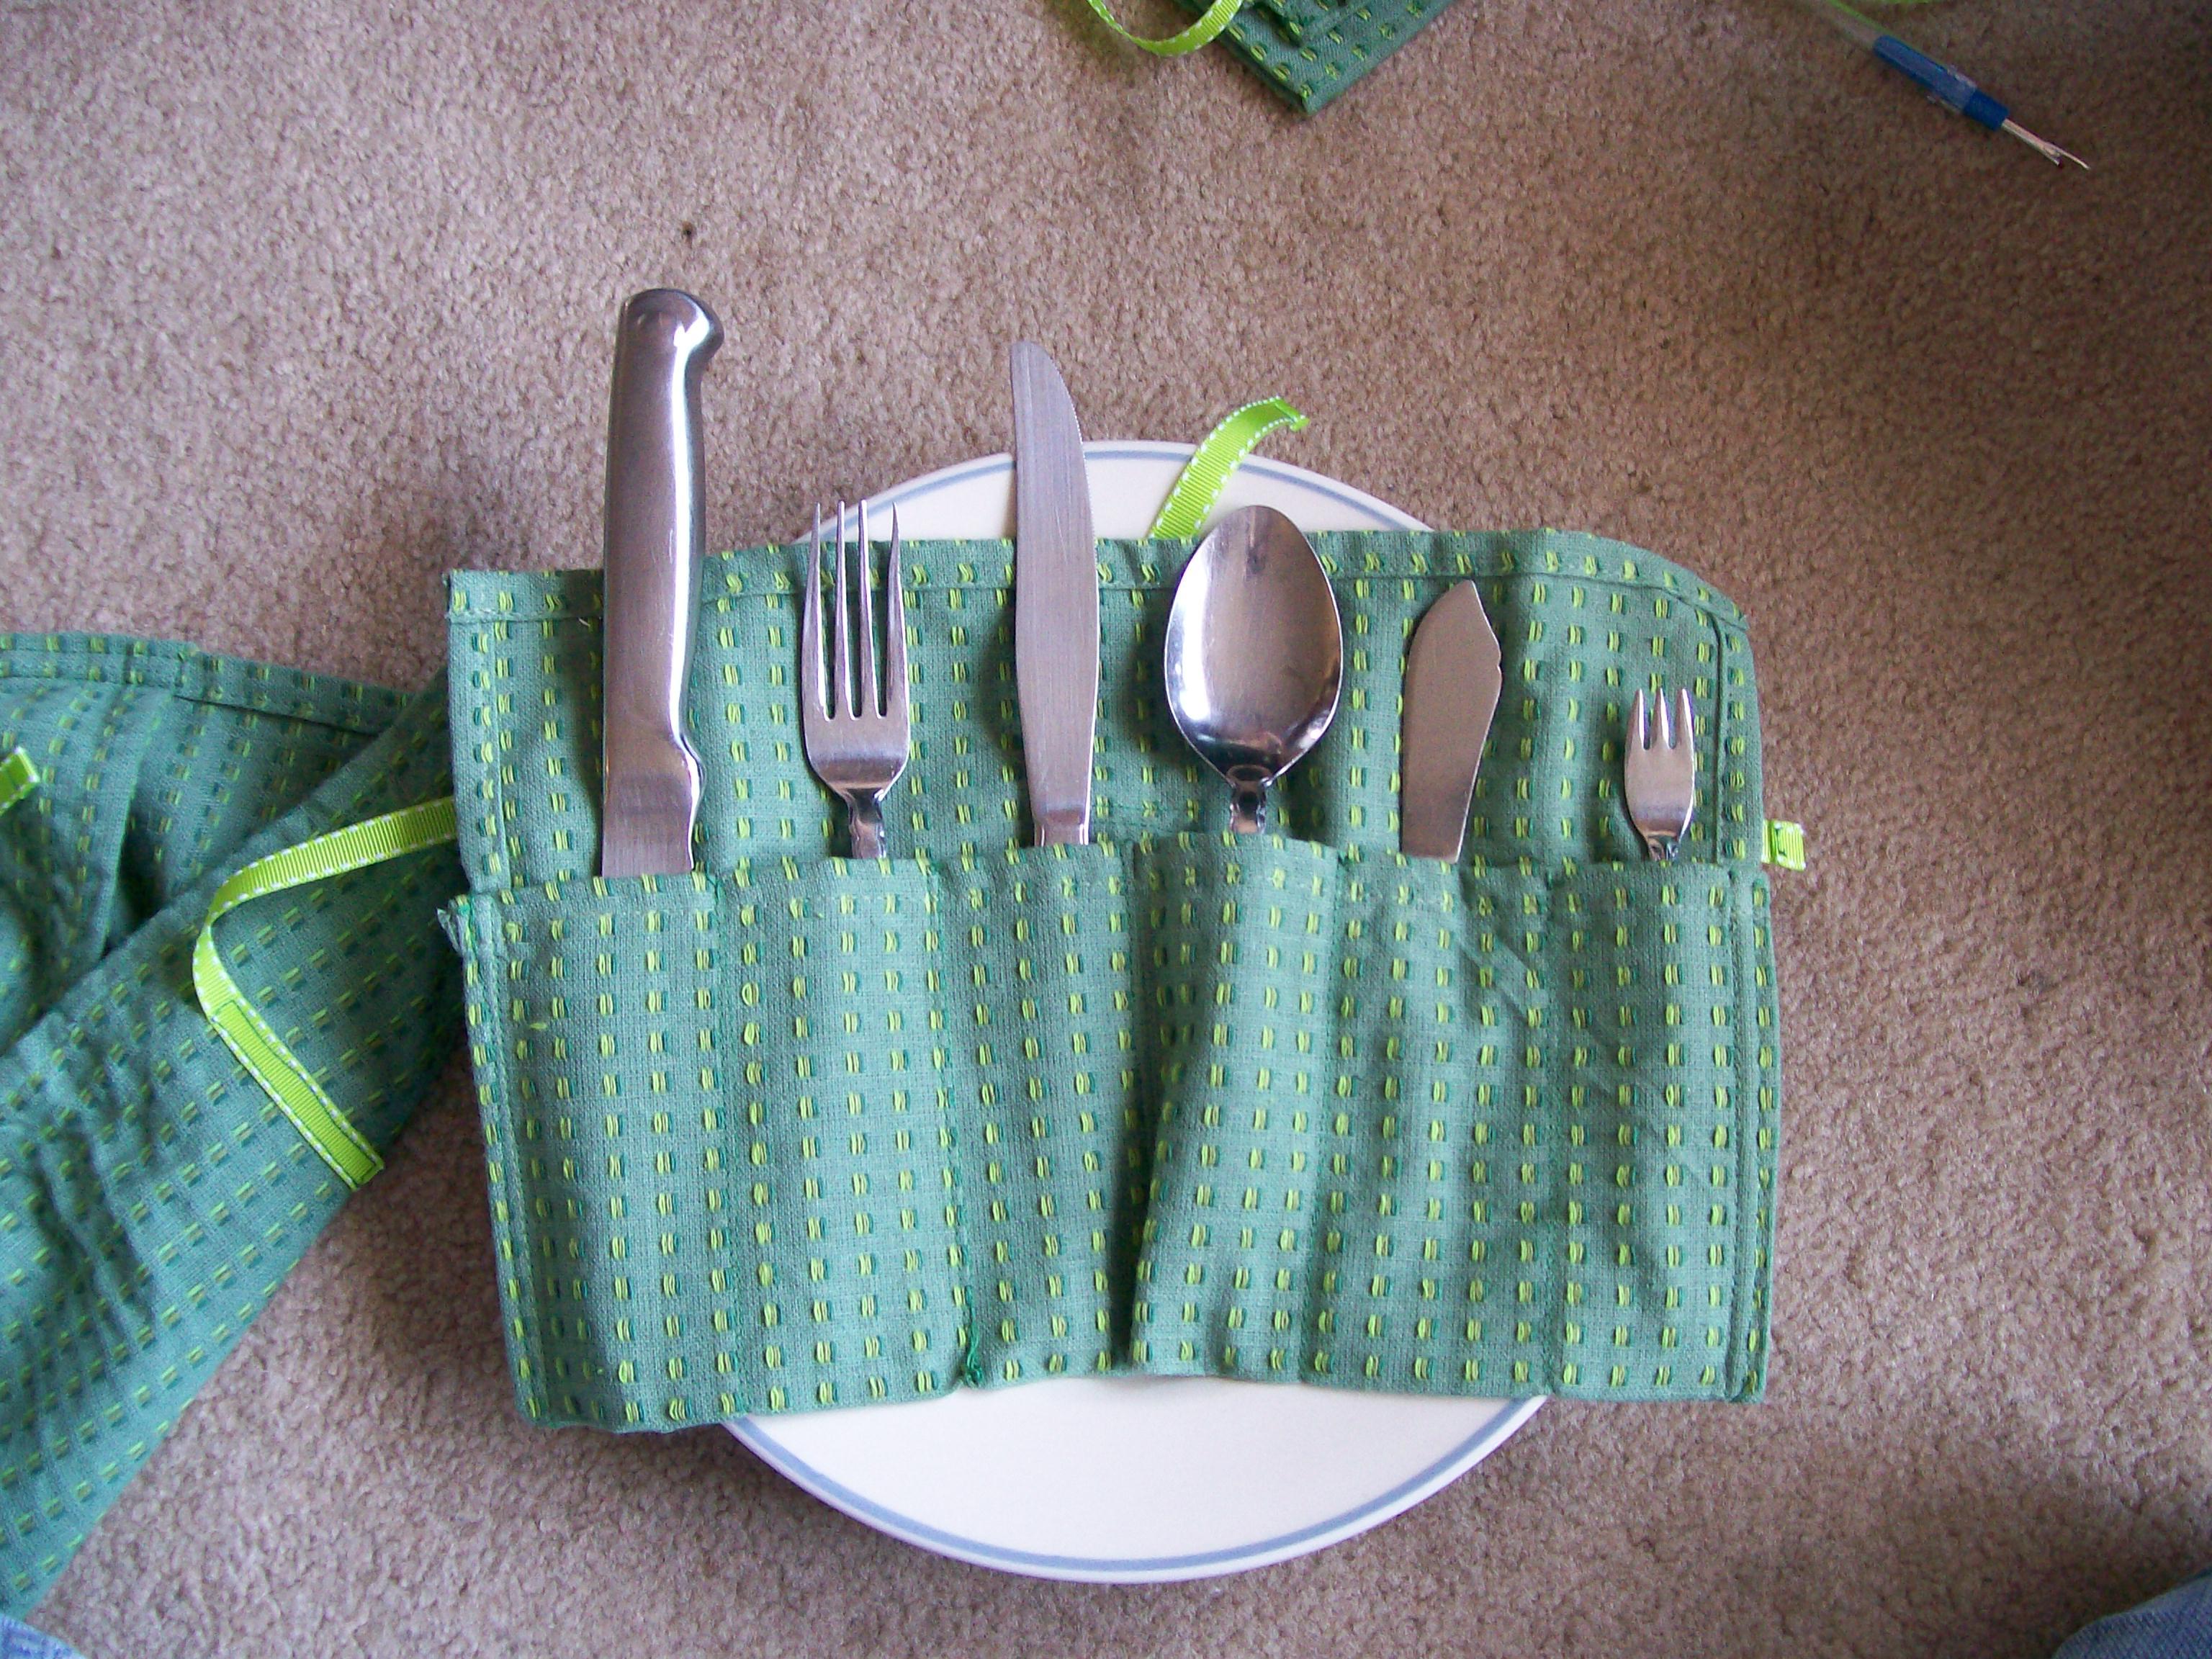 SewUseful Low-Sew Picnic Flateware and Dish Holders